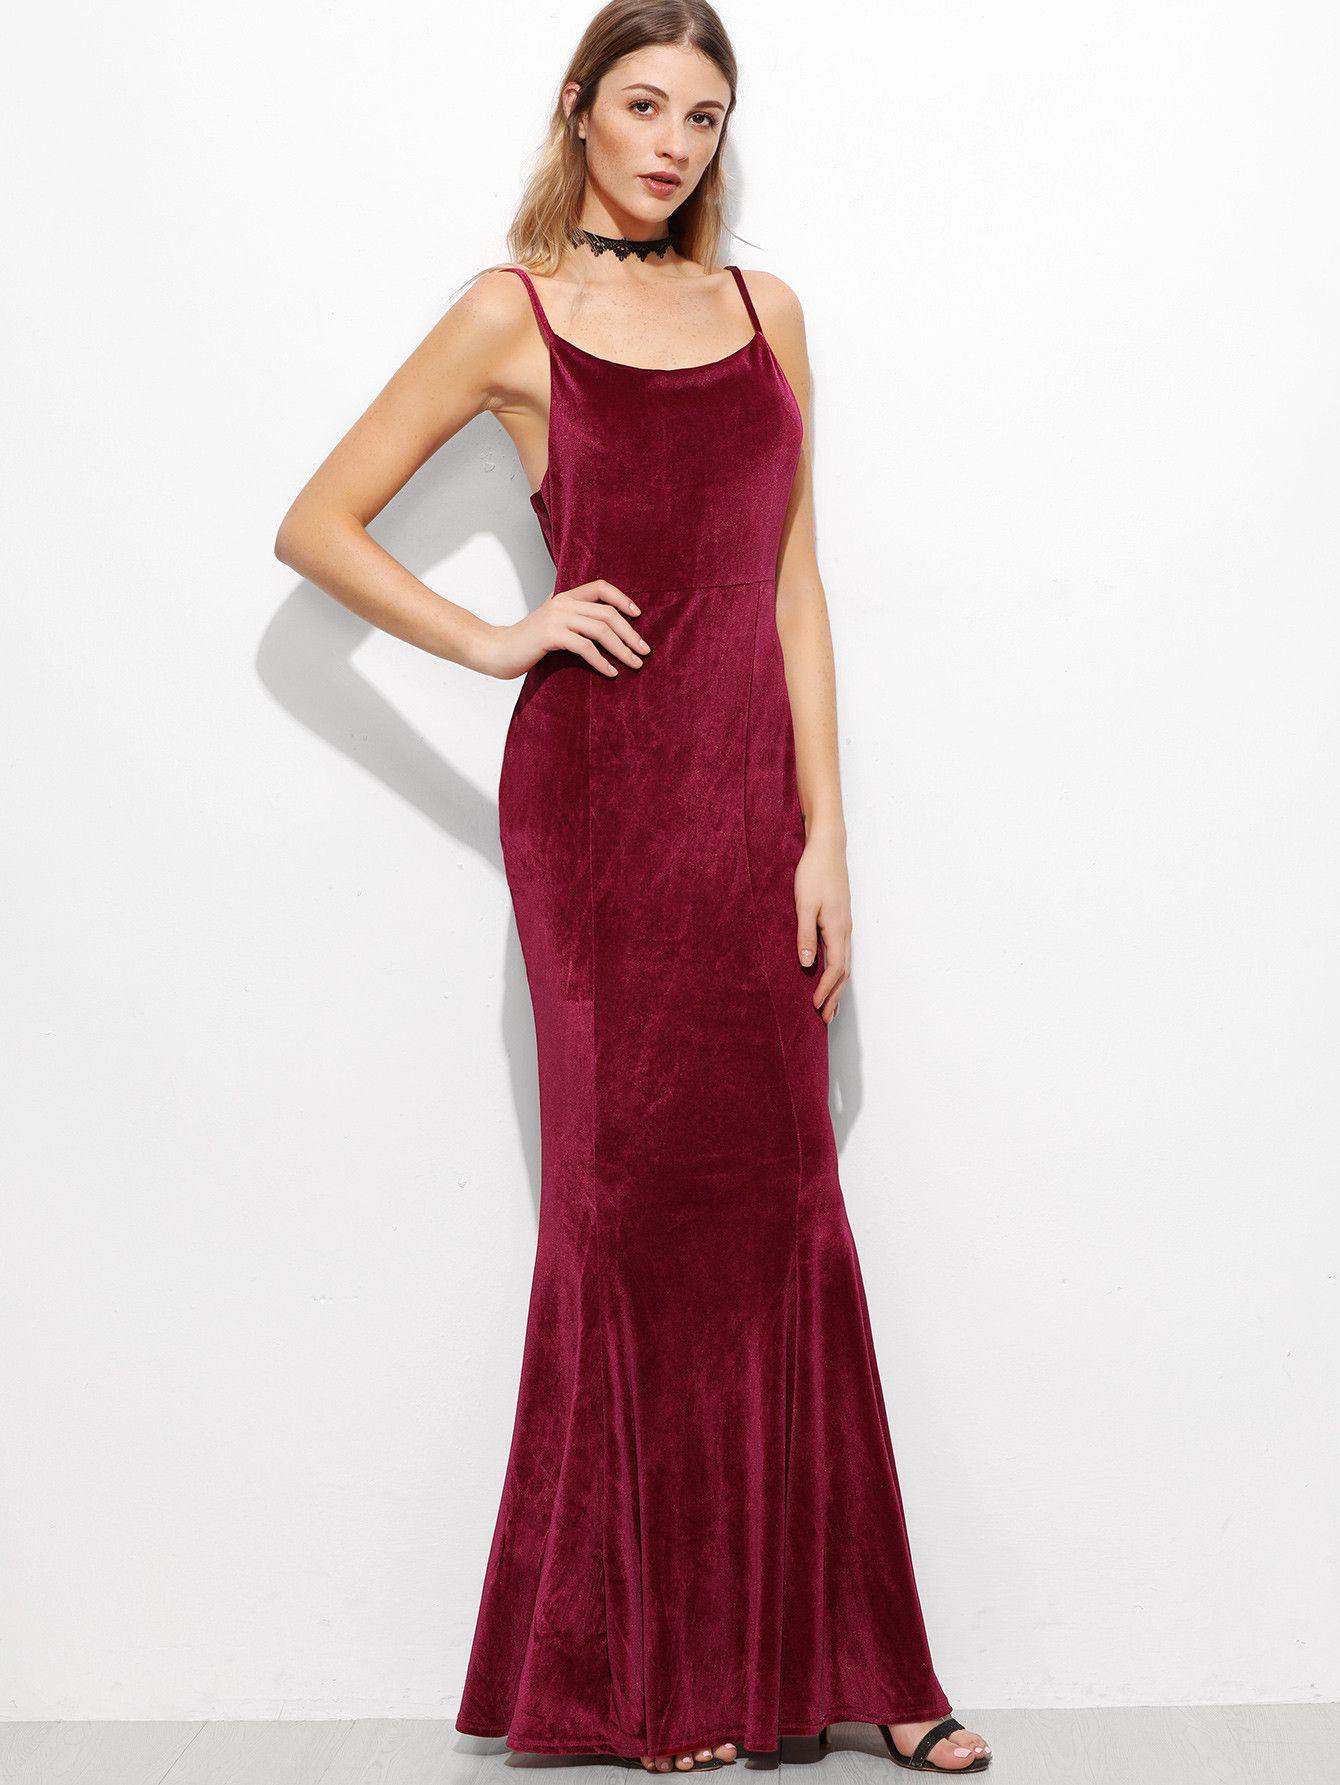 Burgundy spaghetti strap corduroy maxi dress dress burgundy maxi